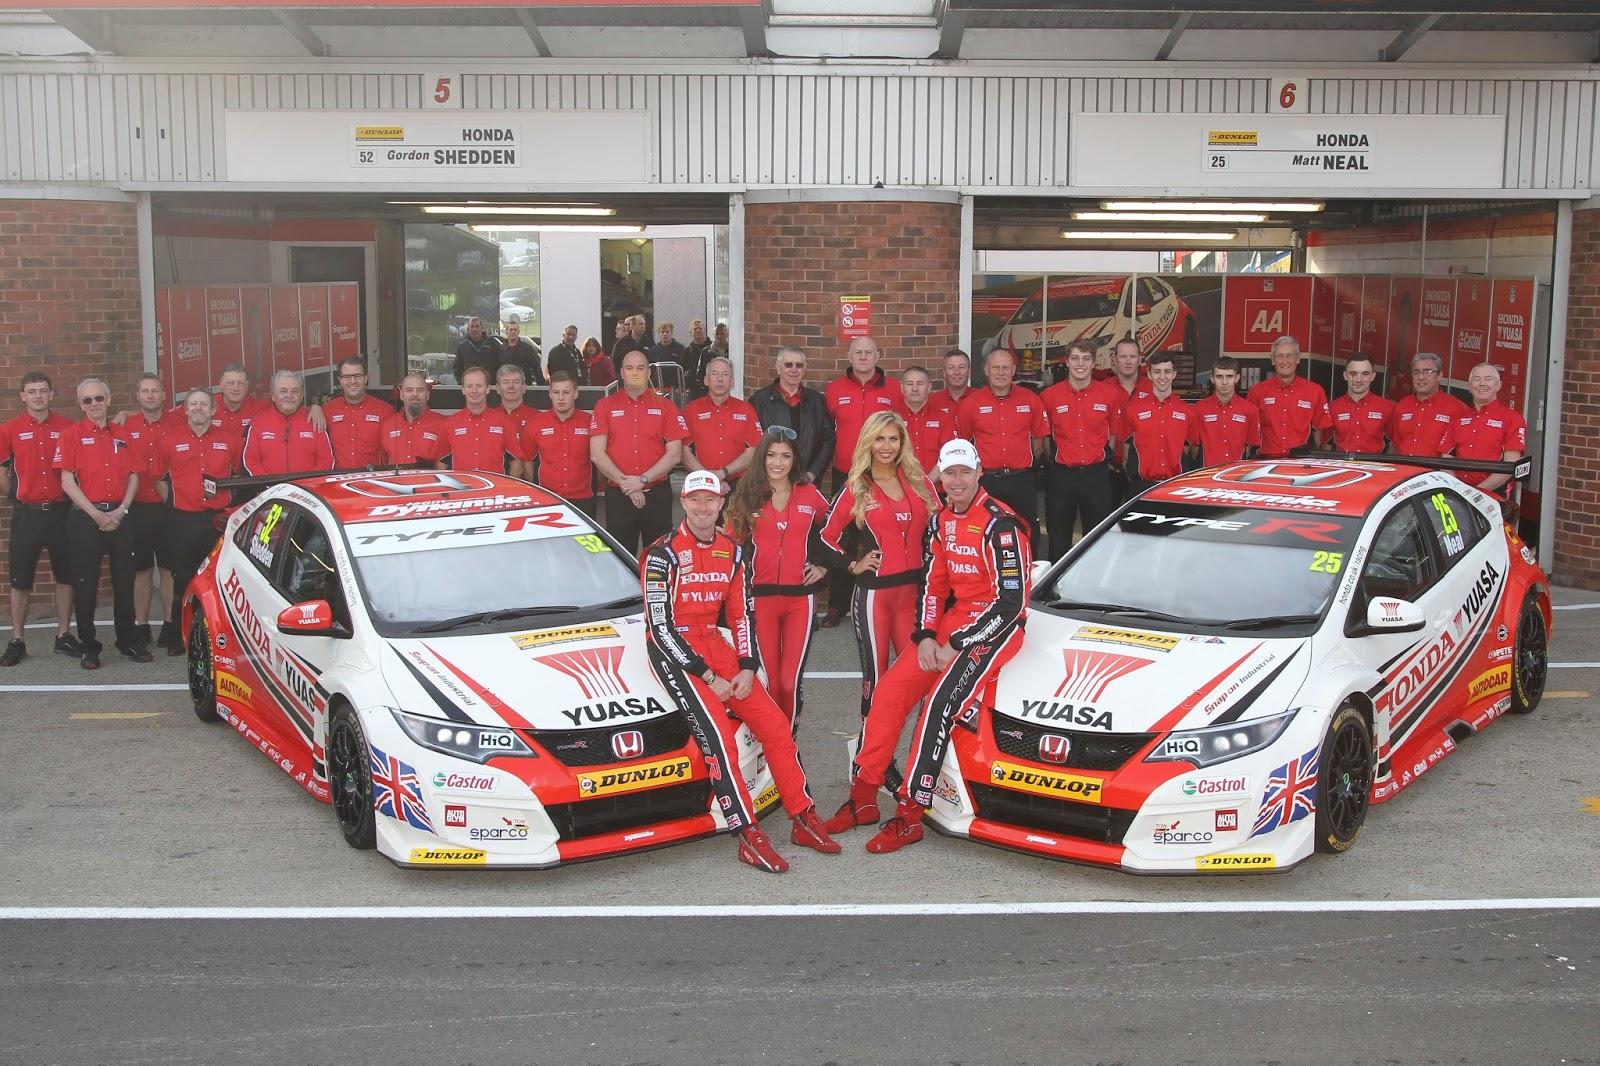 62396 Honda wins BTCC drivers and manufacturers championships Η συλλογή τίτλων μόλις ξεκίνησε για το νέο Civic Type R BTCC, Hatcback, Honda, Honda Civic, Honda Civic Type R, Rally, videos